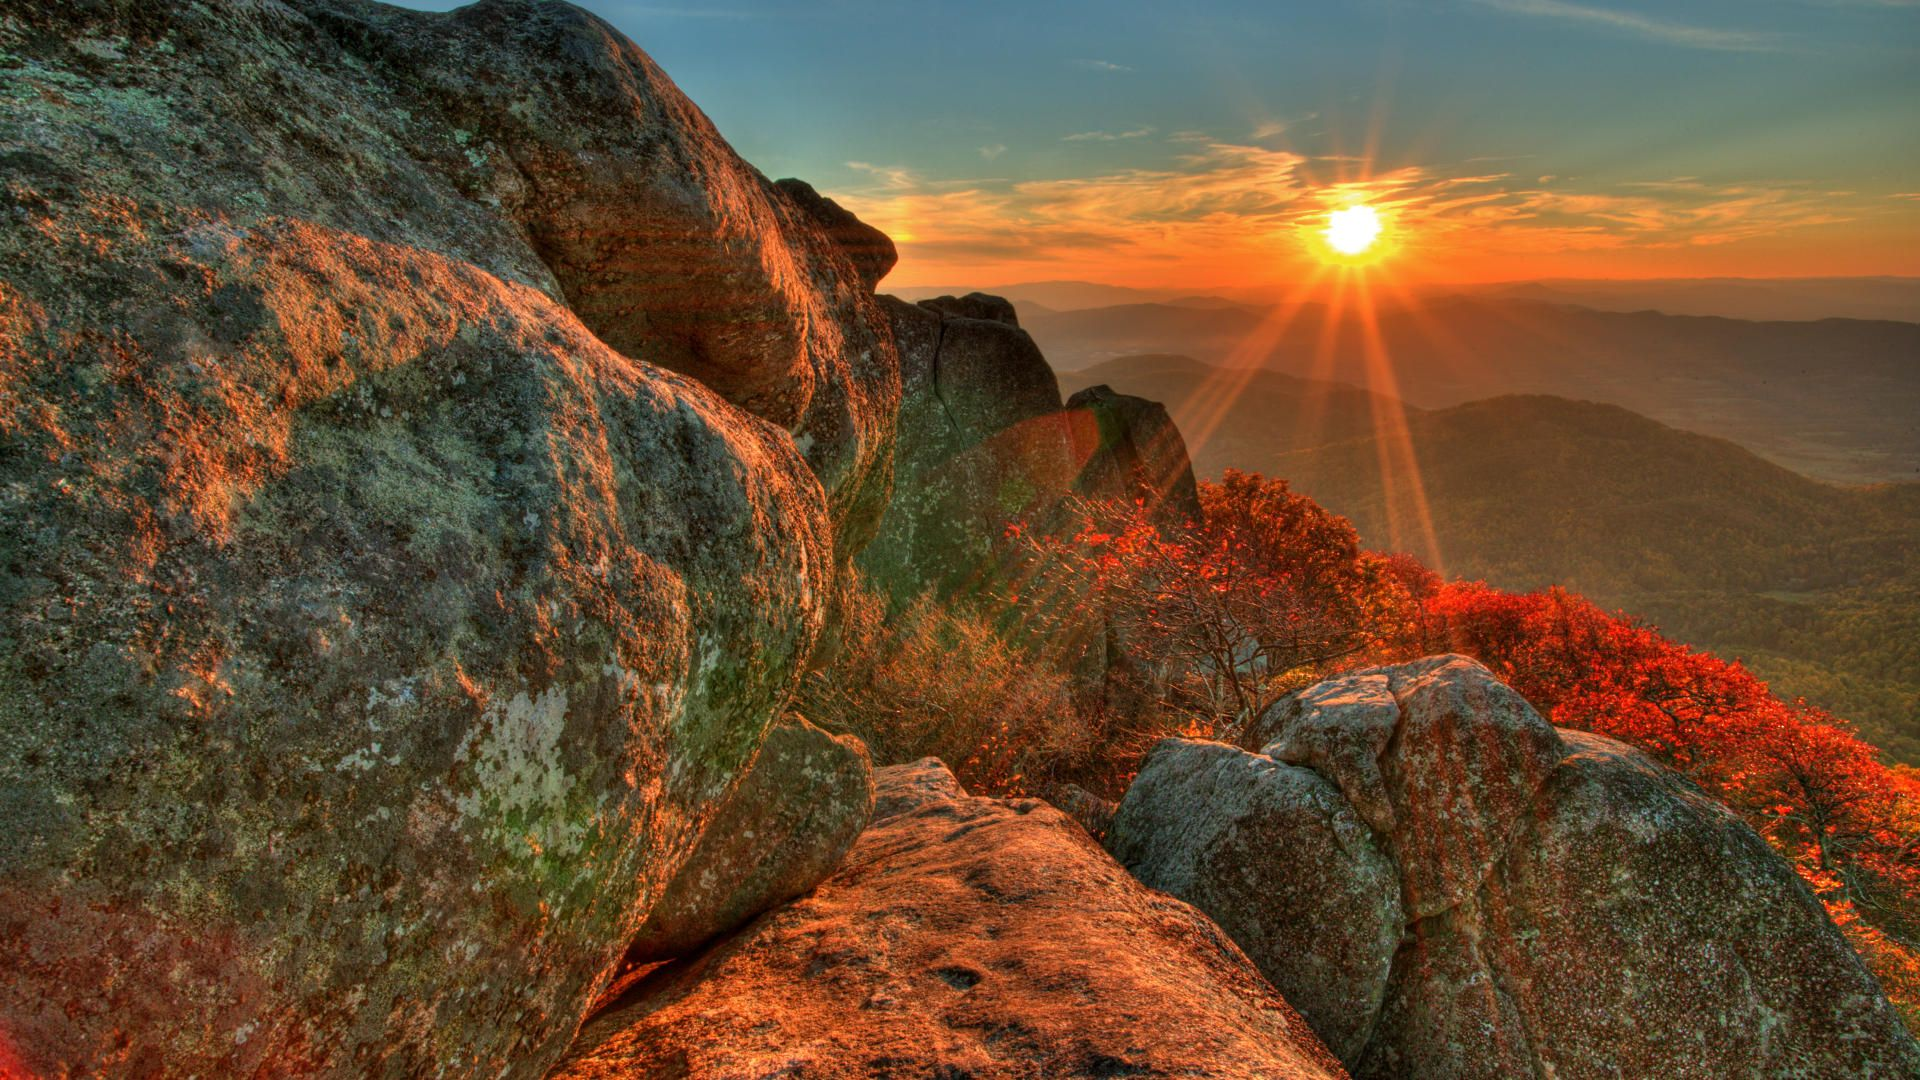 Most Inspiring Wallpaper Mountain Sunrise - 015bdbfcfdae97ecab64fd6ec1b886db  You Should Have_982031.jpg